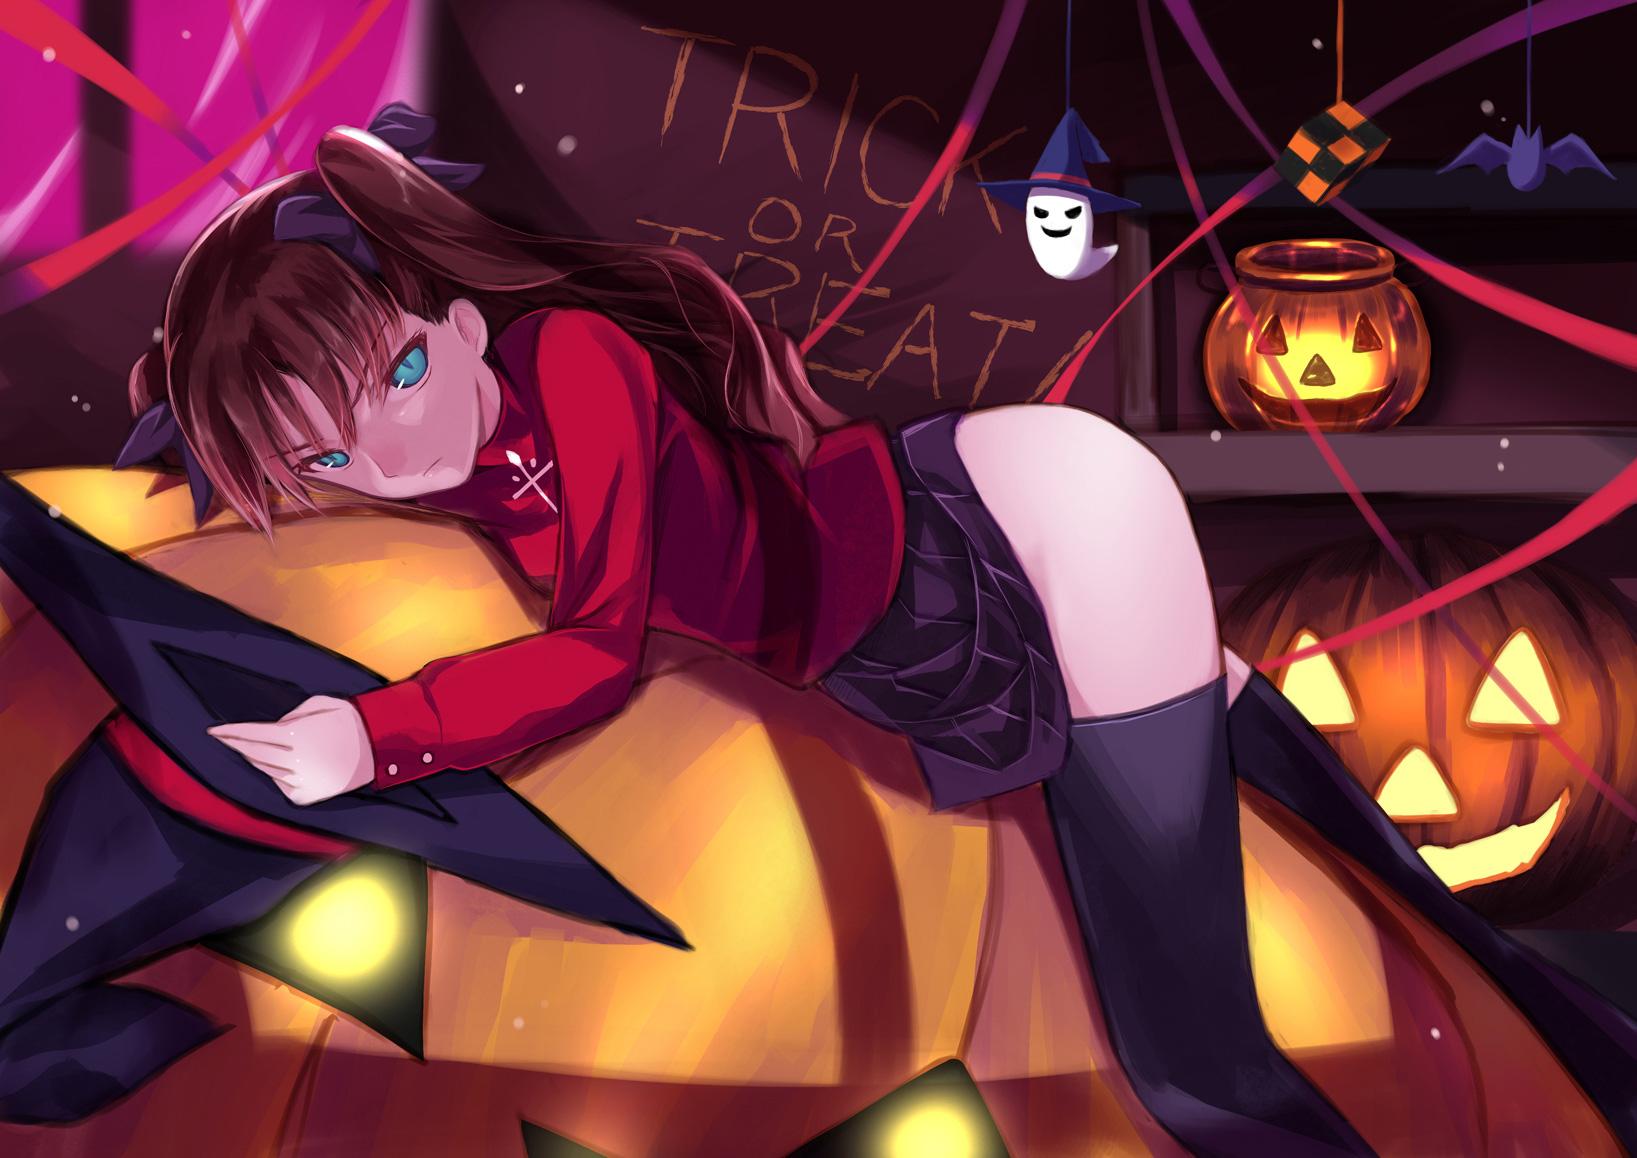 10-Amazing-Halloween-Pixiv-Artworks-#5_遠坂さんからハロウィンへの誘い_香月☆一_Haruhichan.com